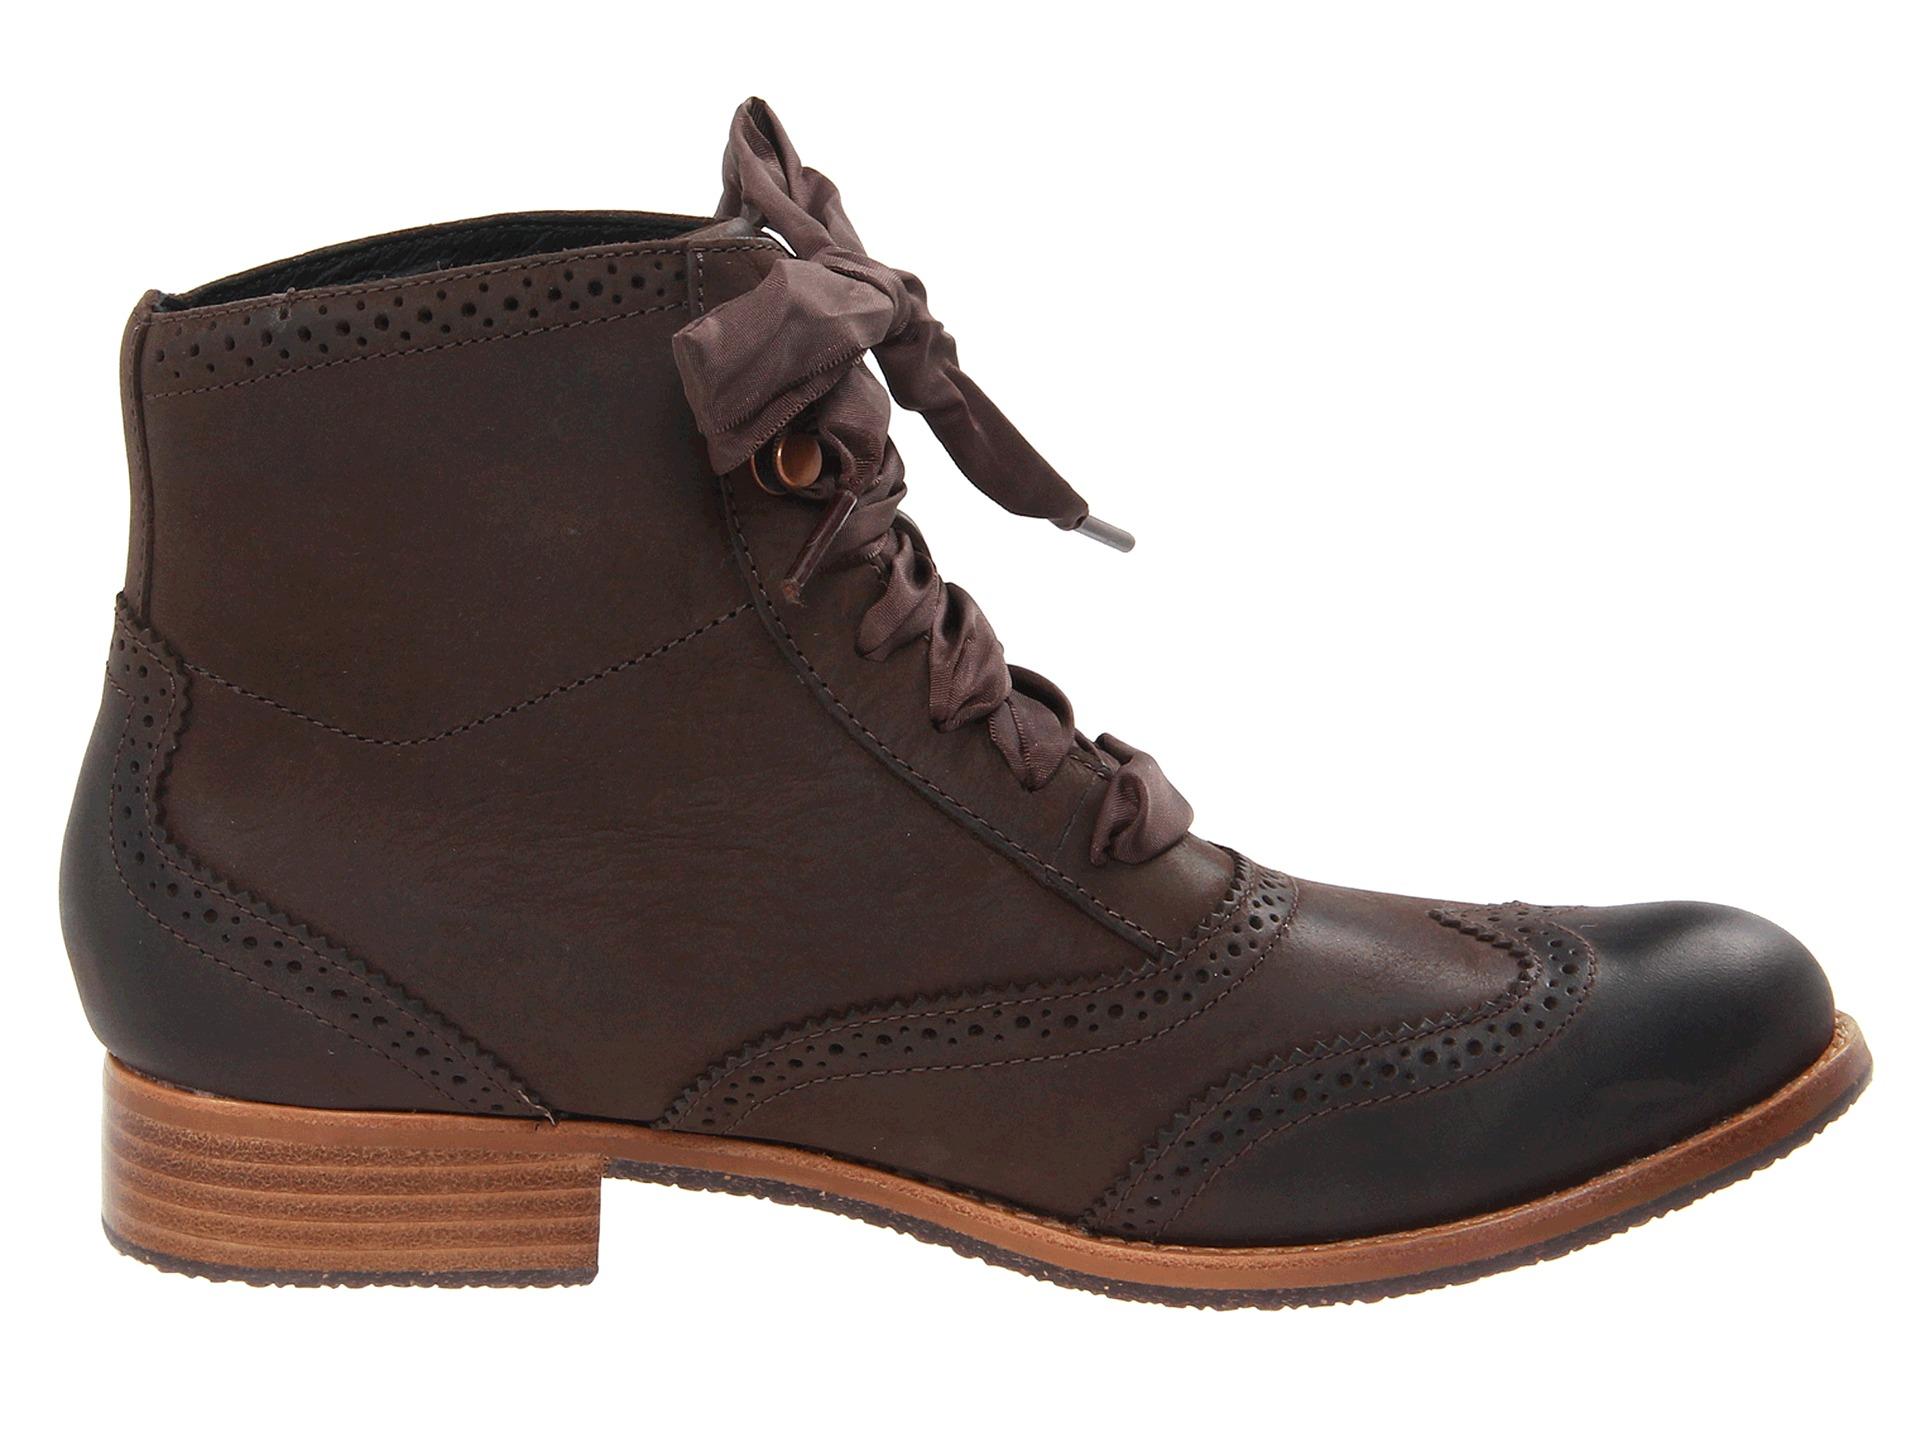 sebago claremont boot mahogany zappos free shipping